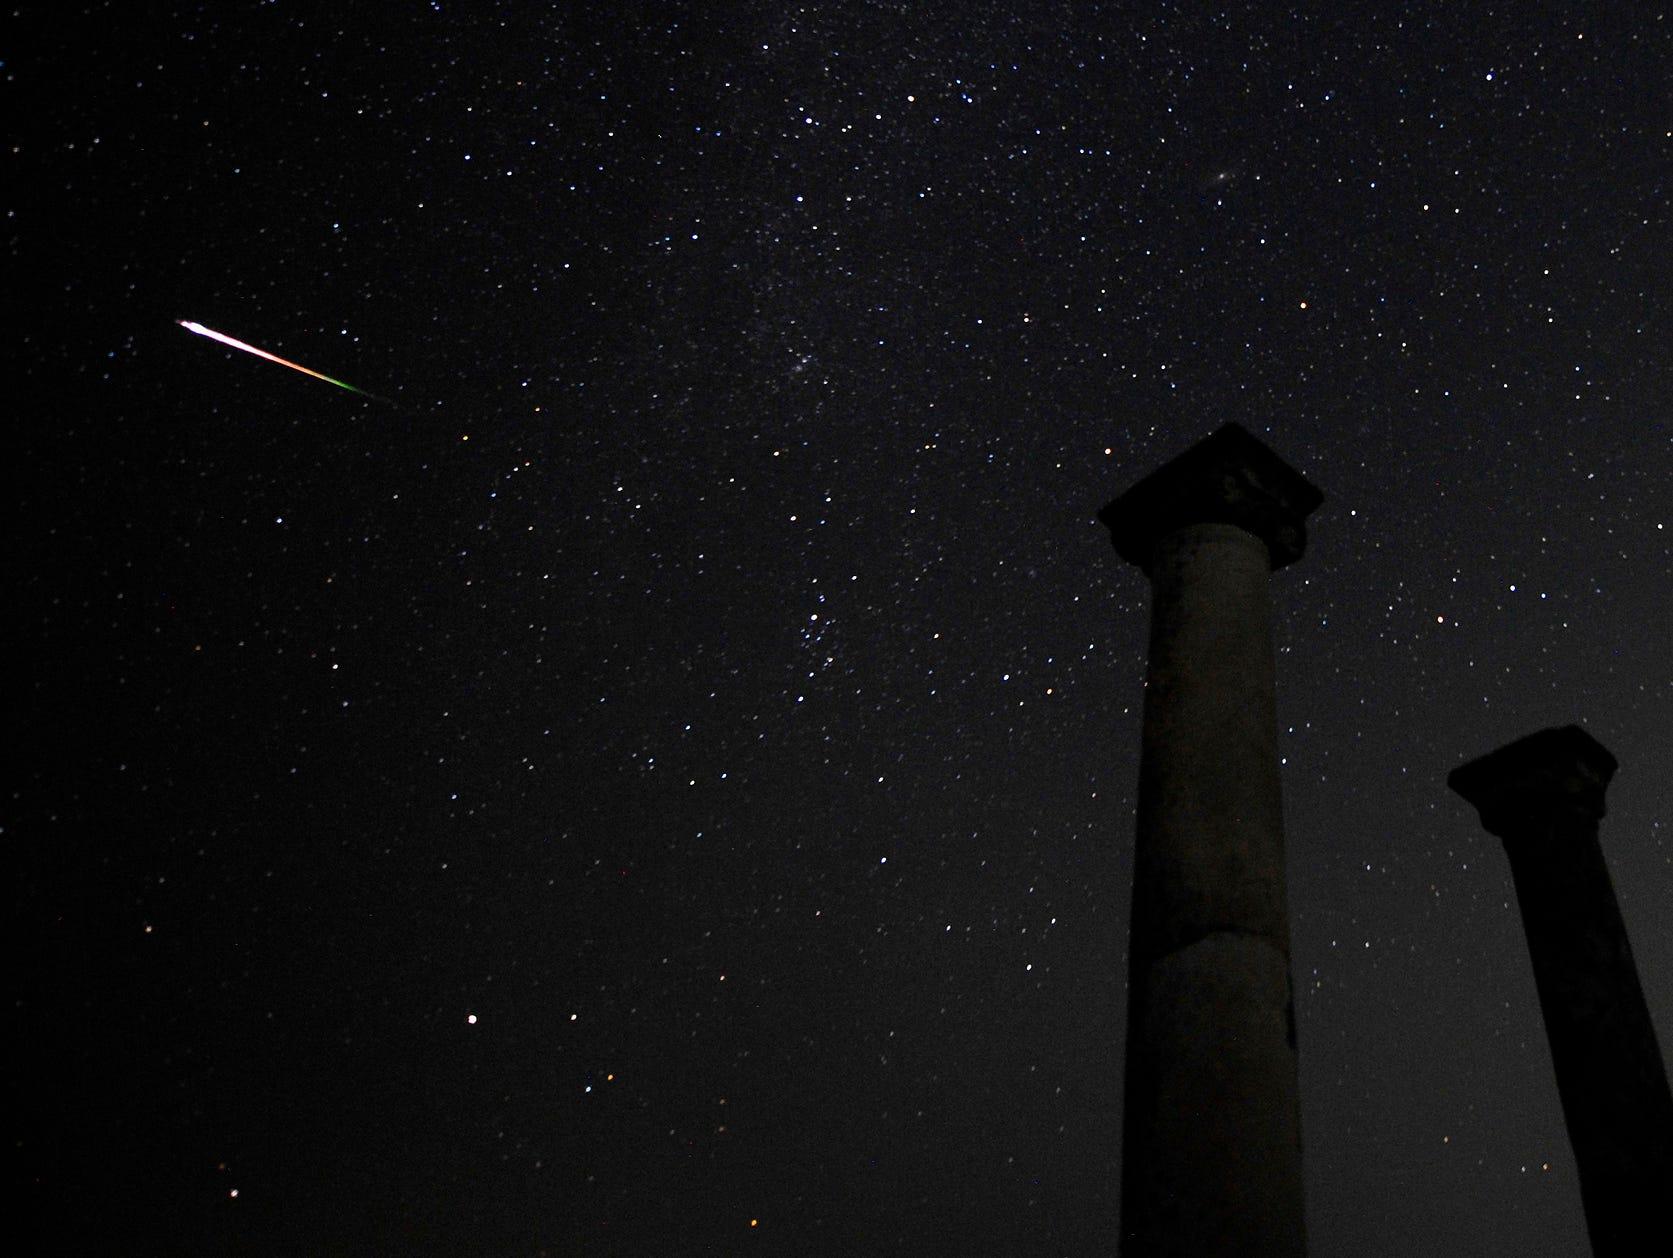 A meteor streaks across the sky above the Stobi archaeological site in Skopje, Macedonia.